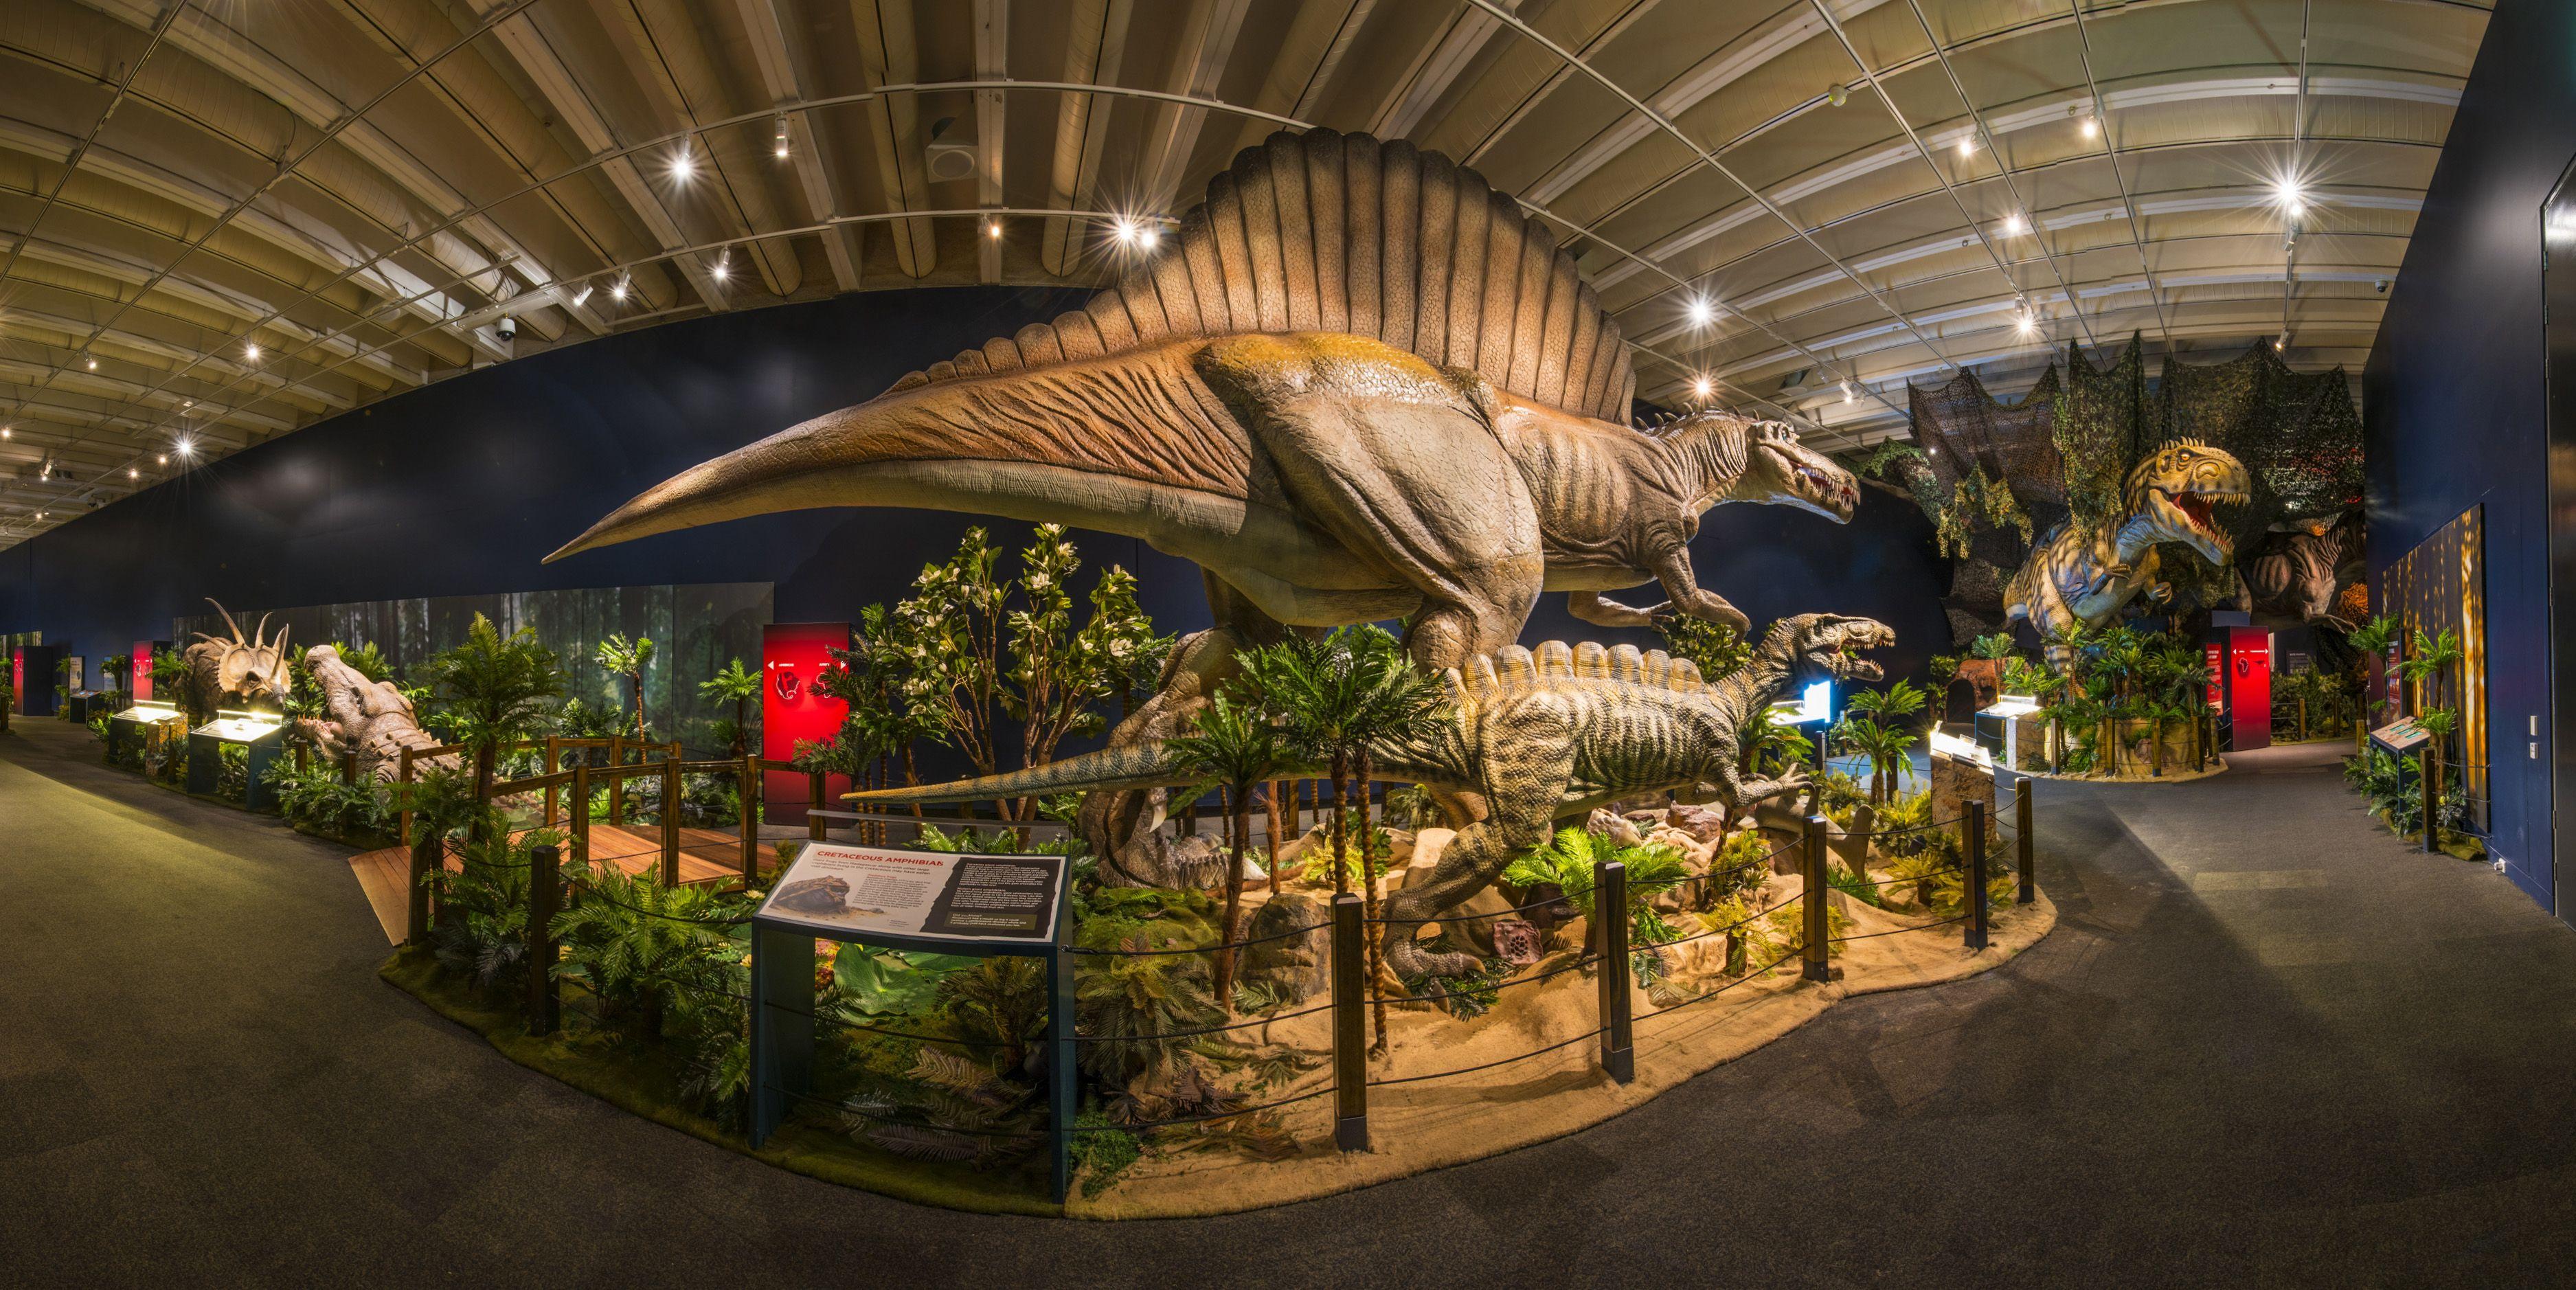 D Printing Exhibition Brisbane : Sneak peek inside dinosaur discovery lost creatures of